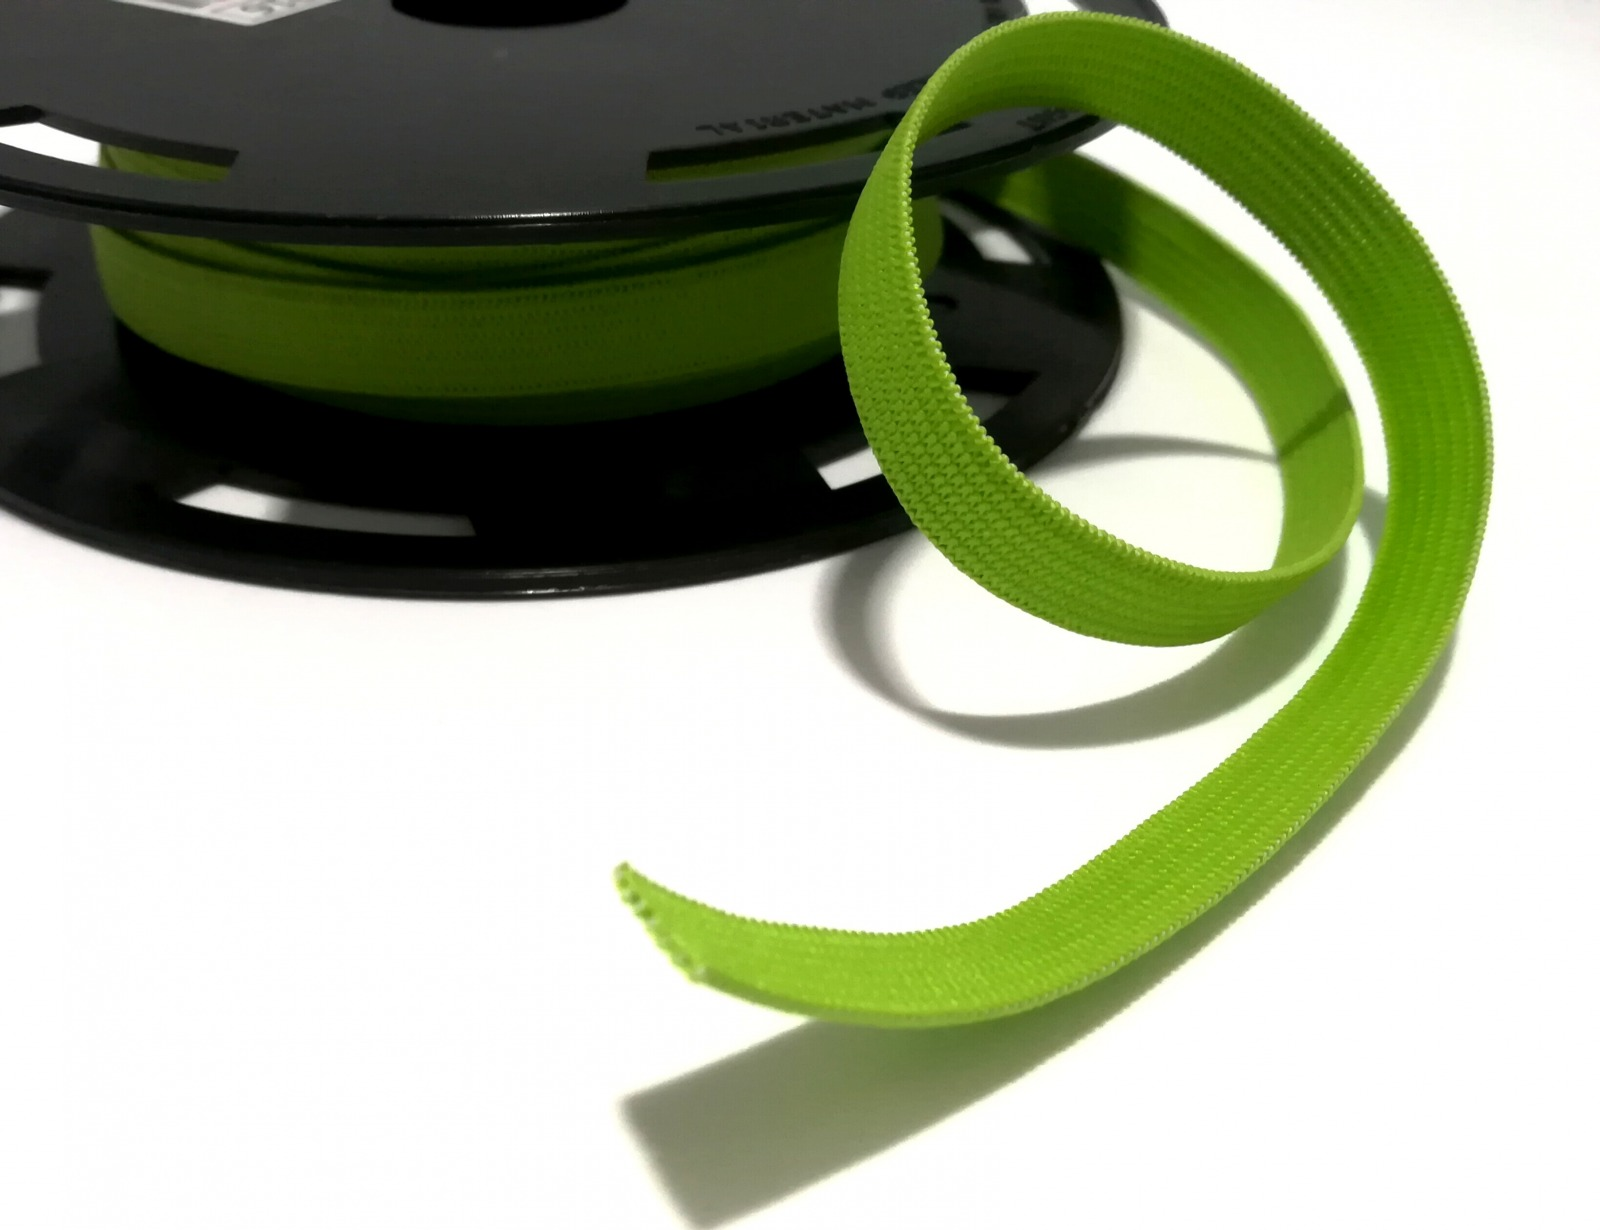 Flachgummi 1cm breit hellgrün